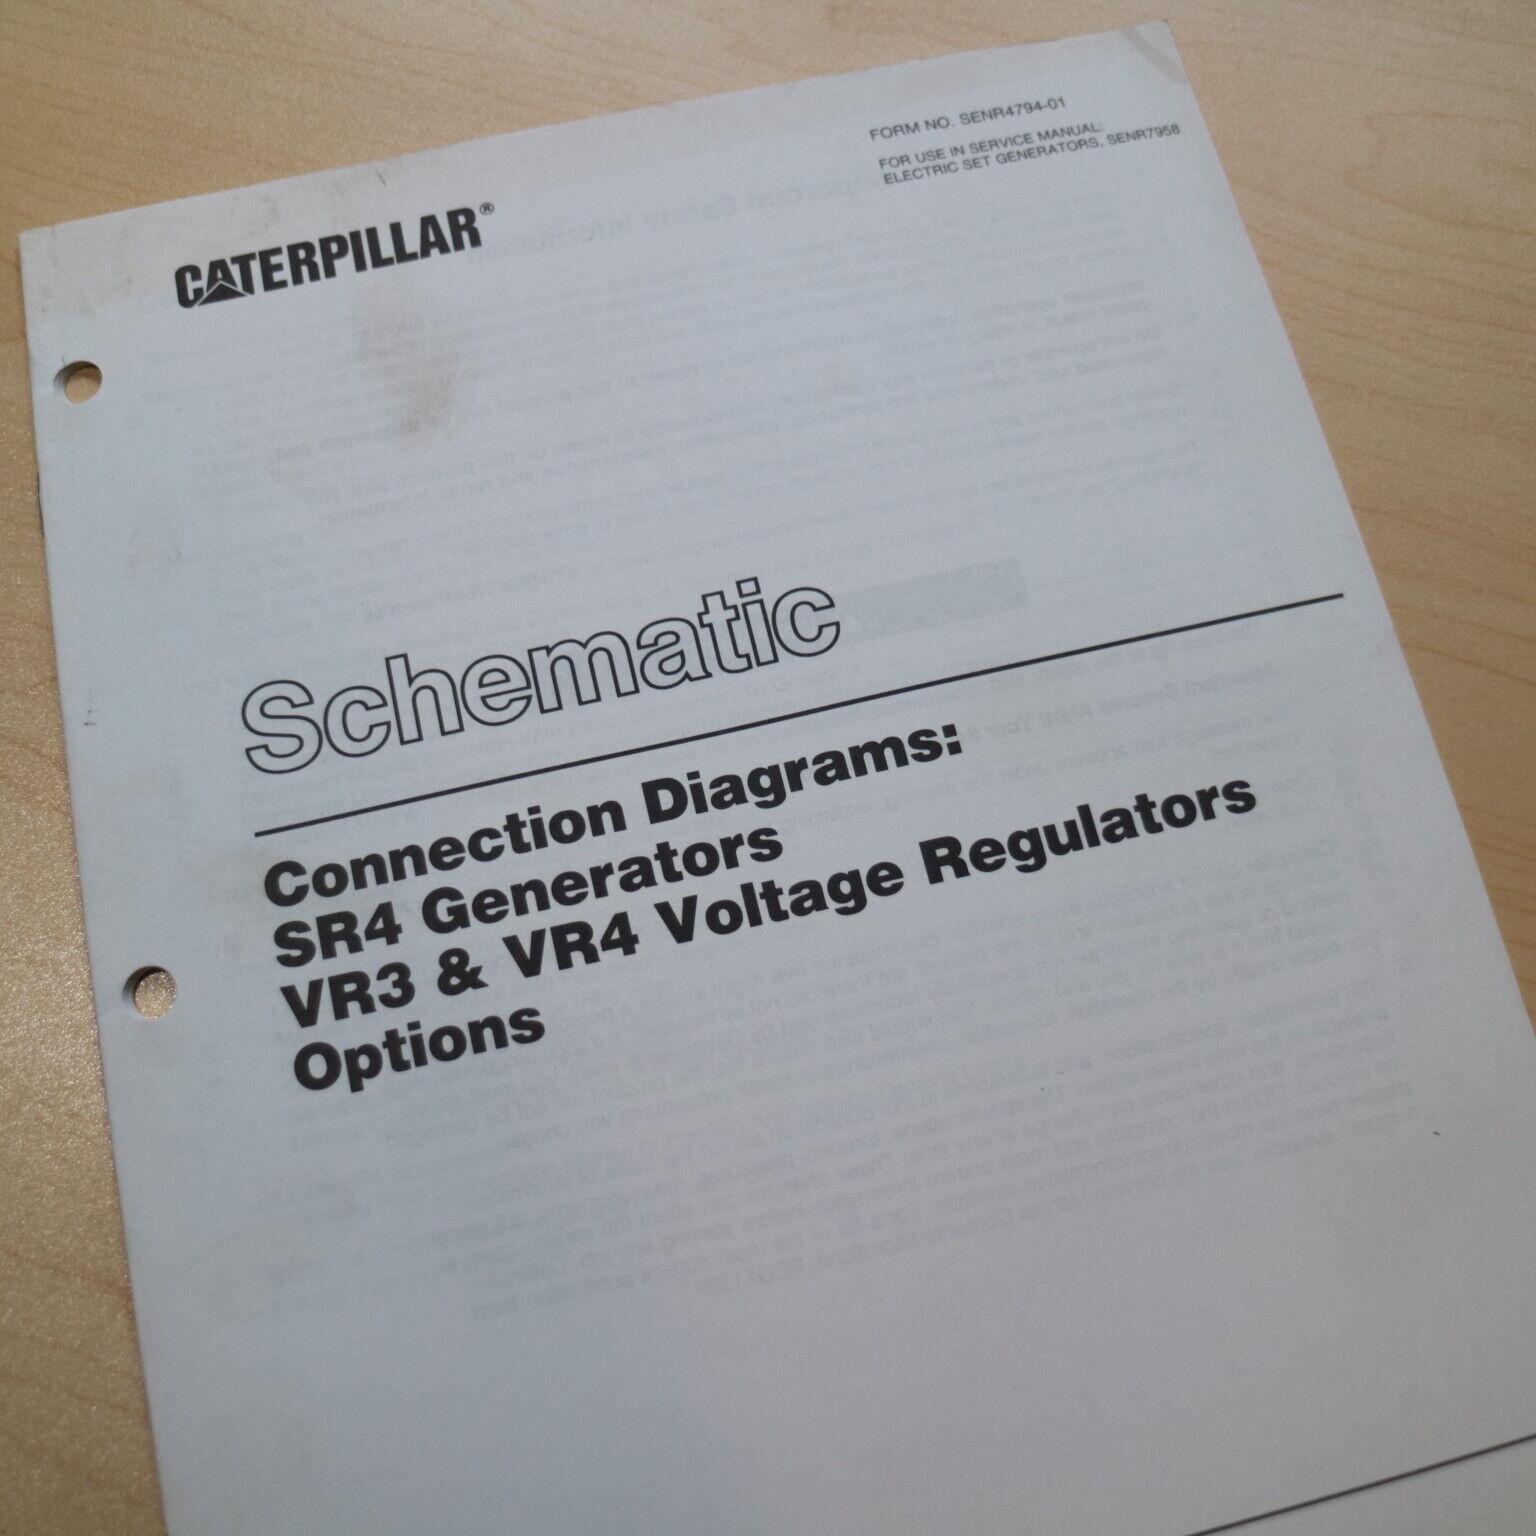 Caterpillar Schematic Diagrams Sr4 Generator Vr3 Vr4 Voltage Regulator  Options for sale online   eBayeBay